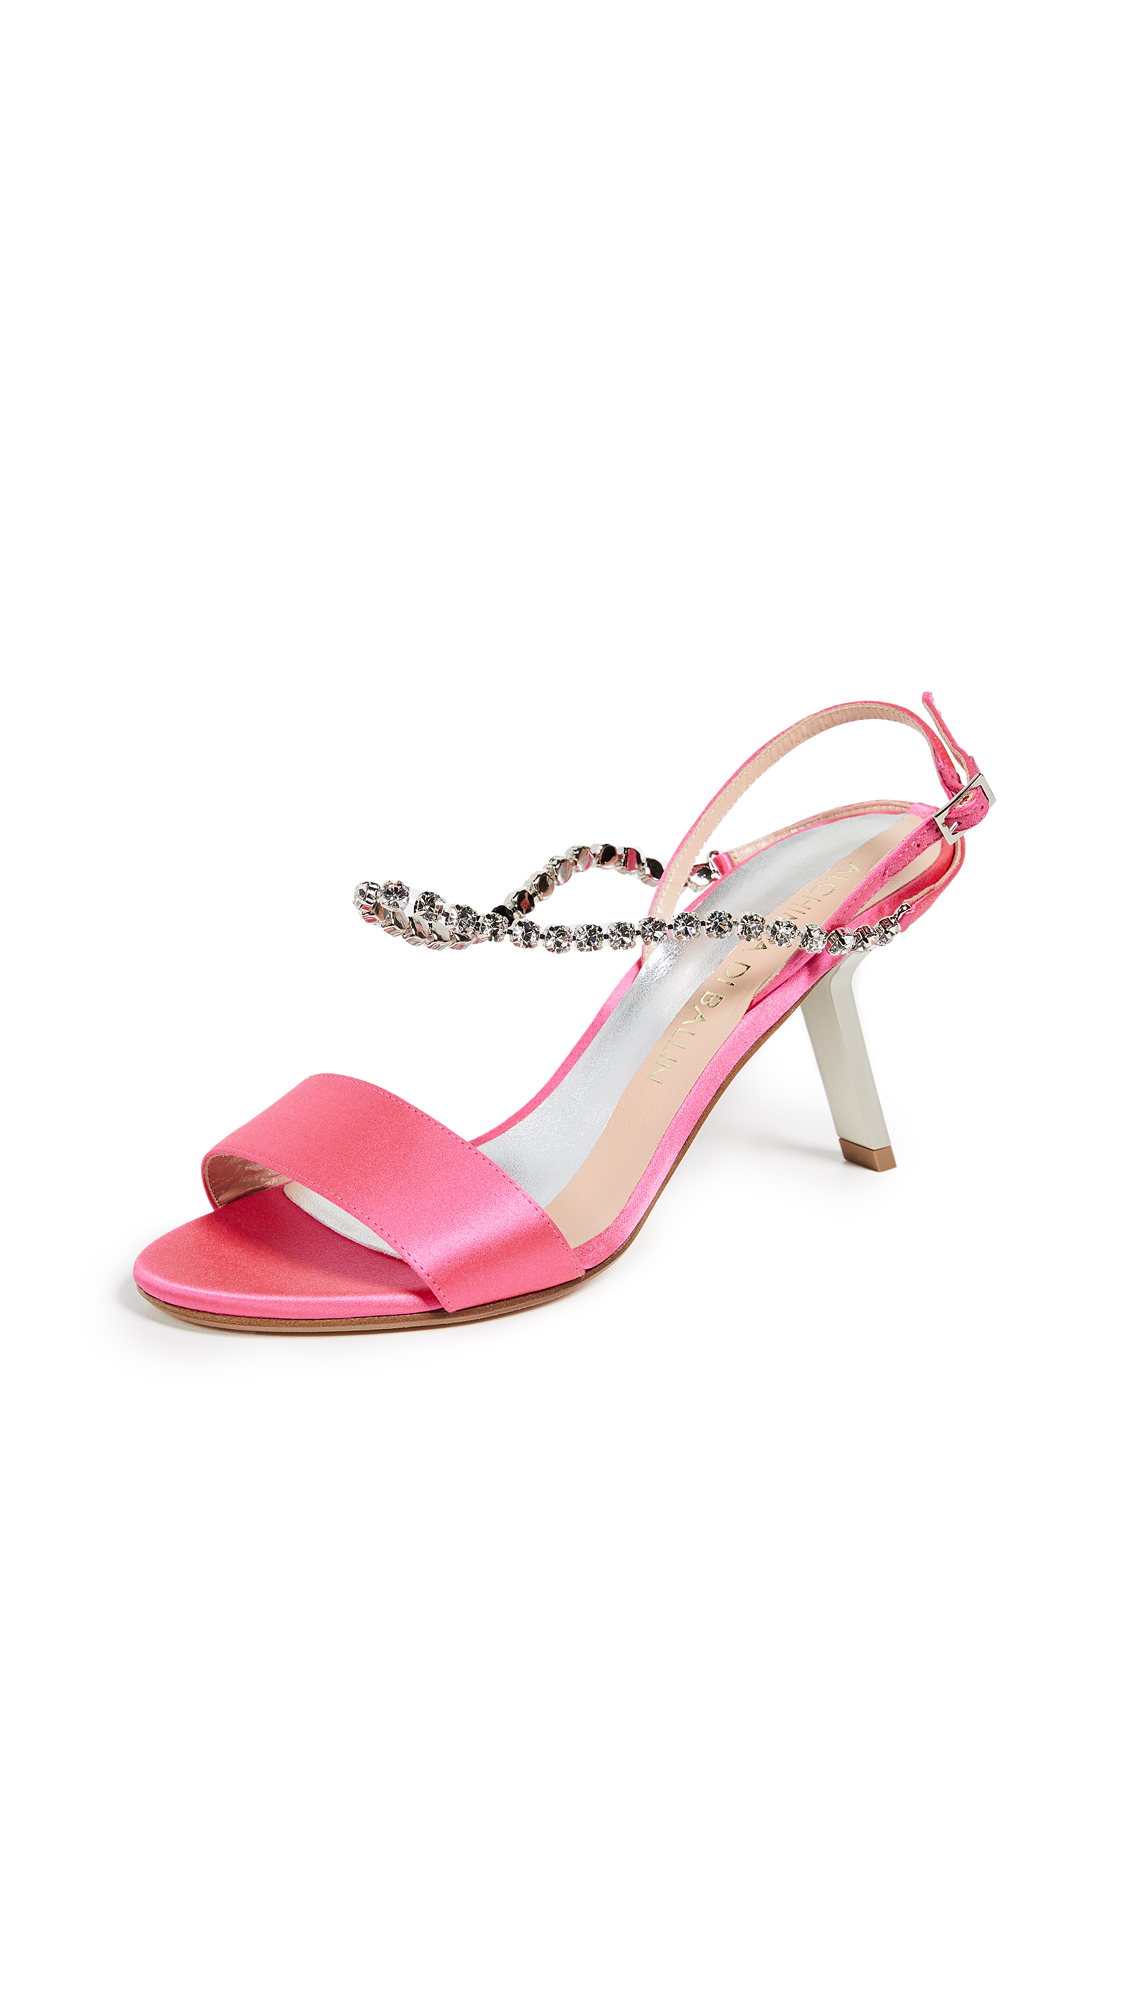 Alchimia di Ballin Satin Strass Sandals - Shocking Pink